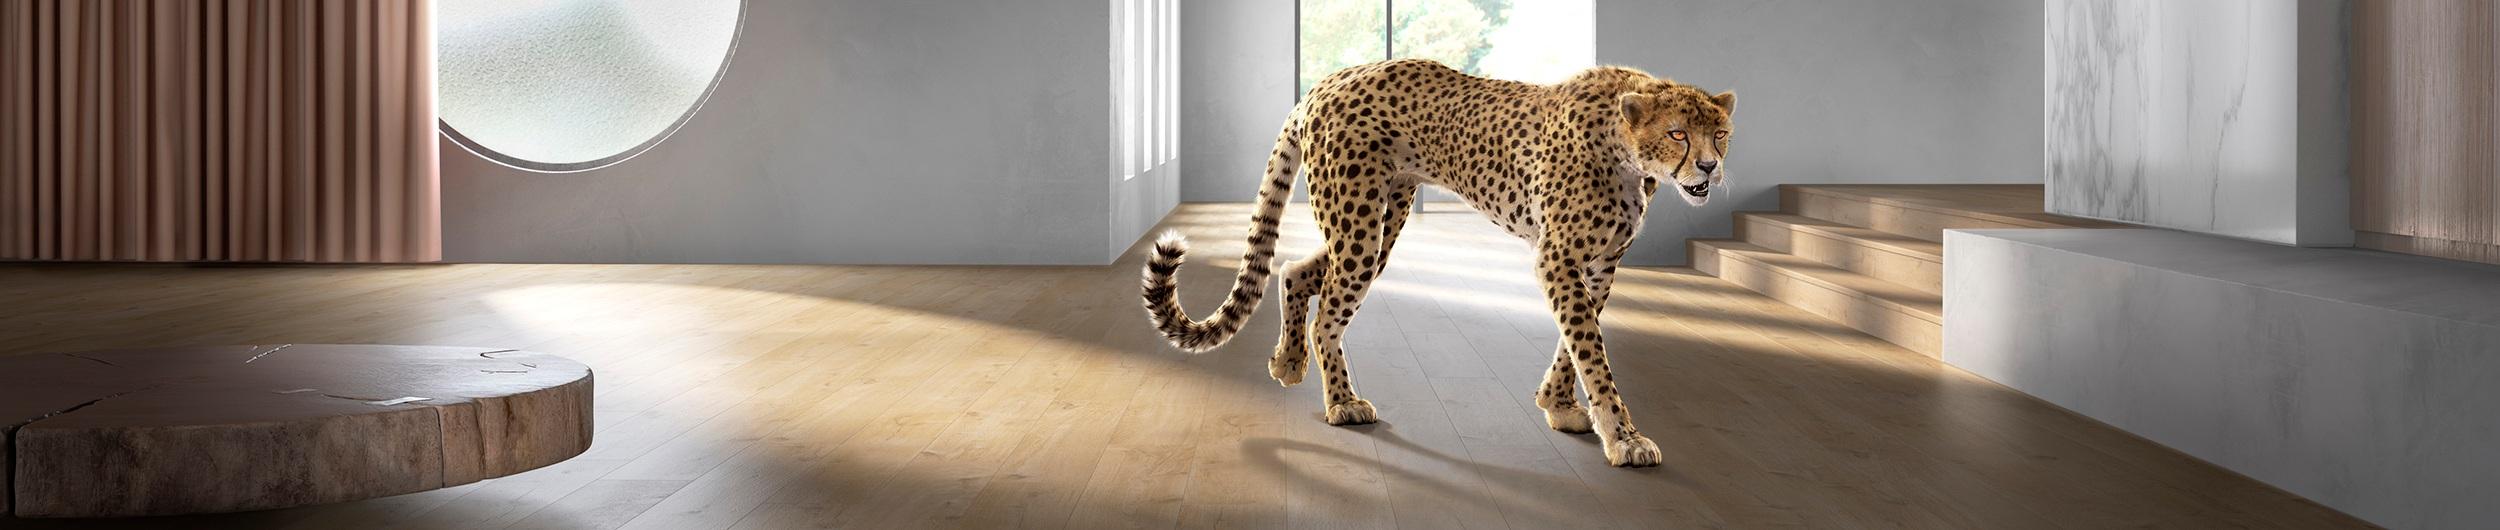 Walking_decor_cheetah_moved_2500px.jpg